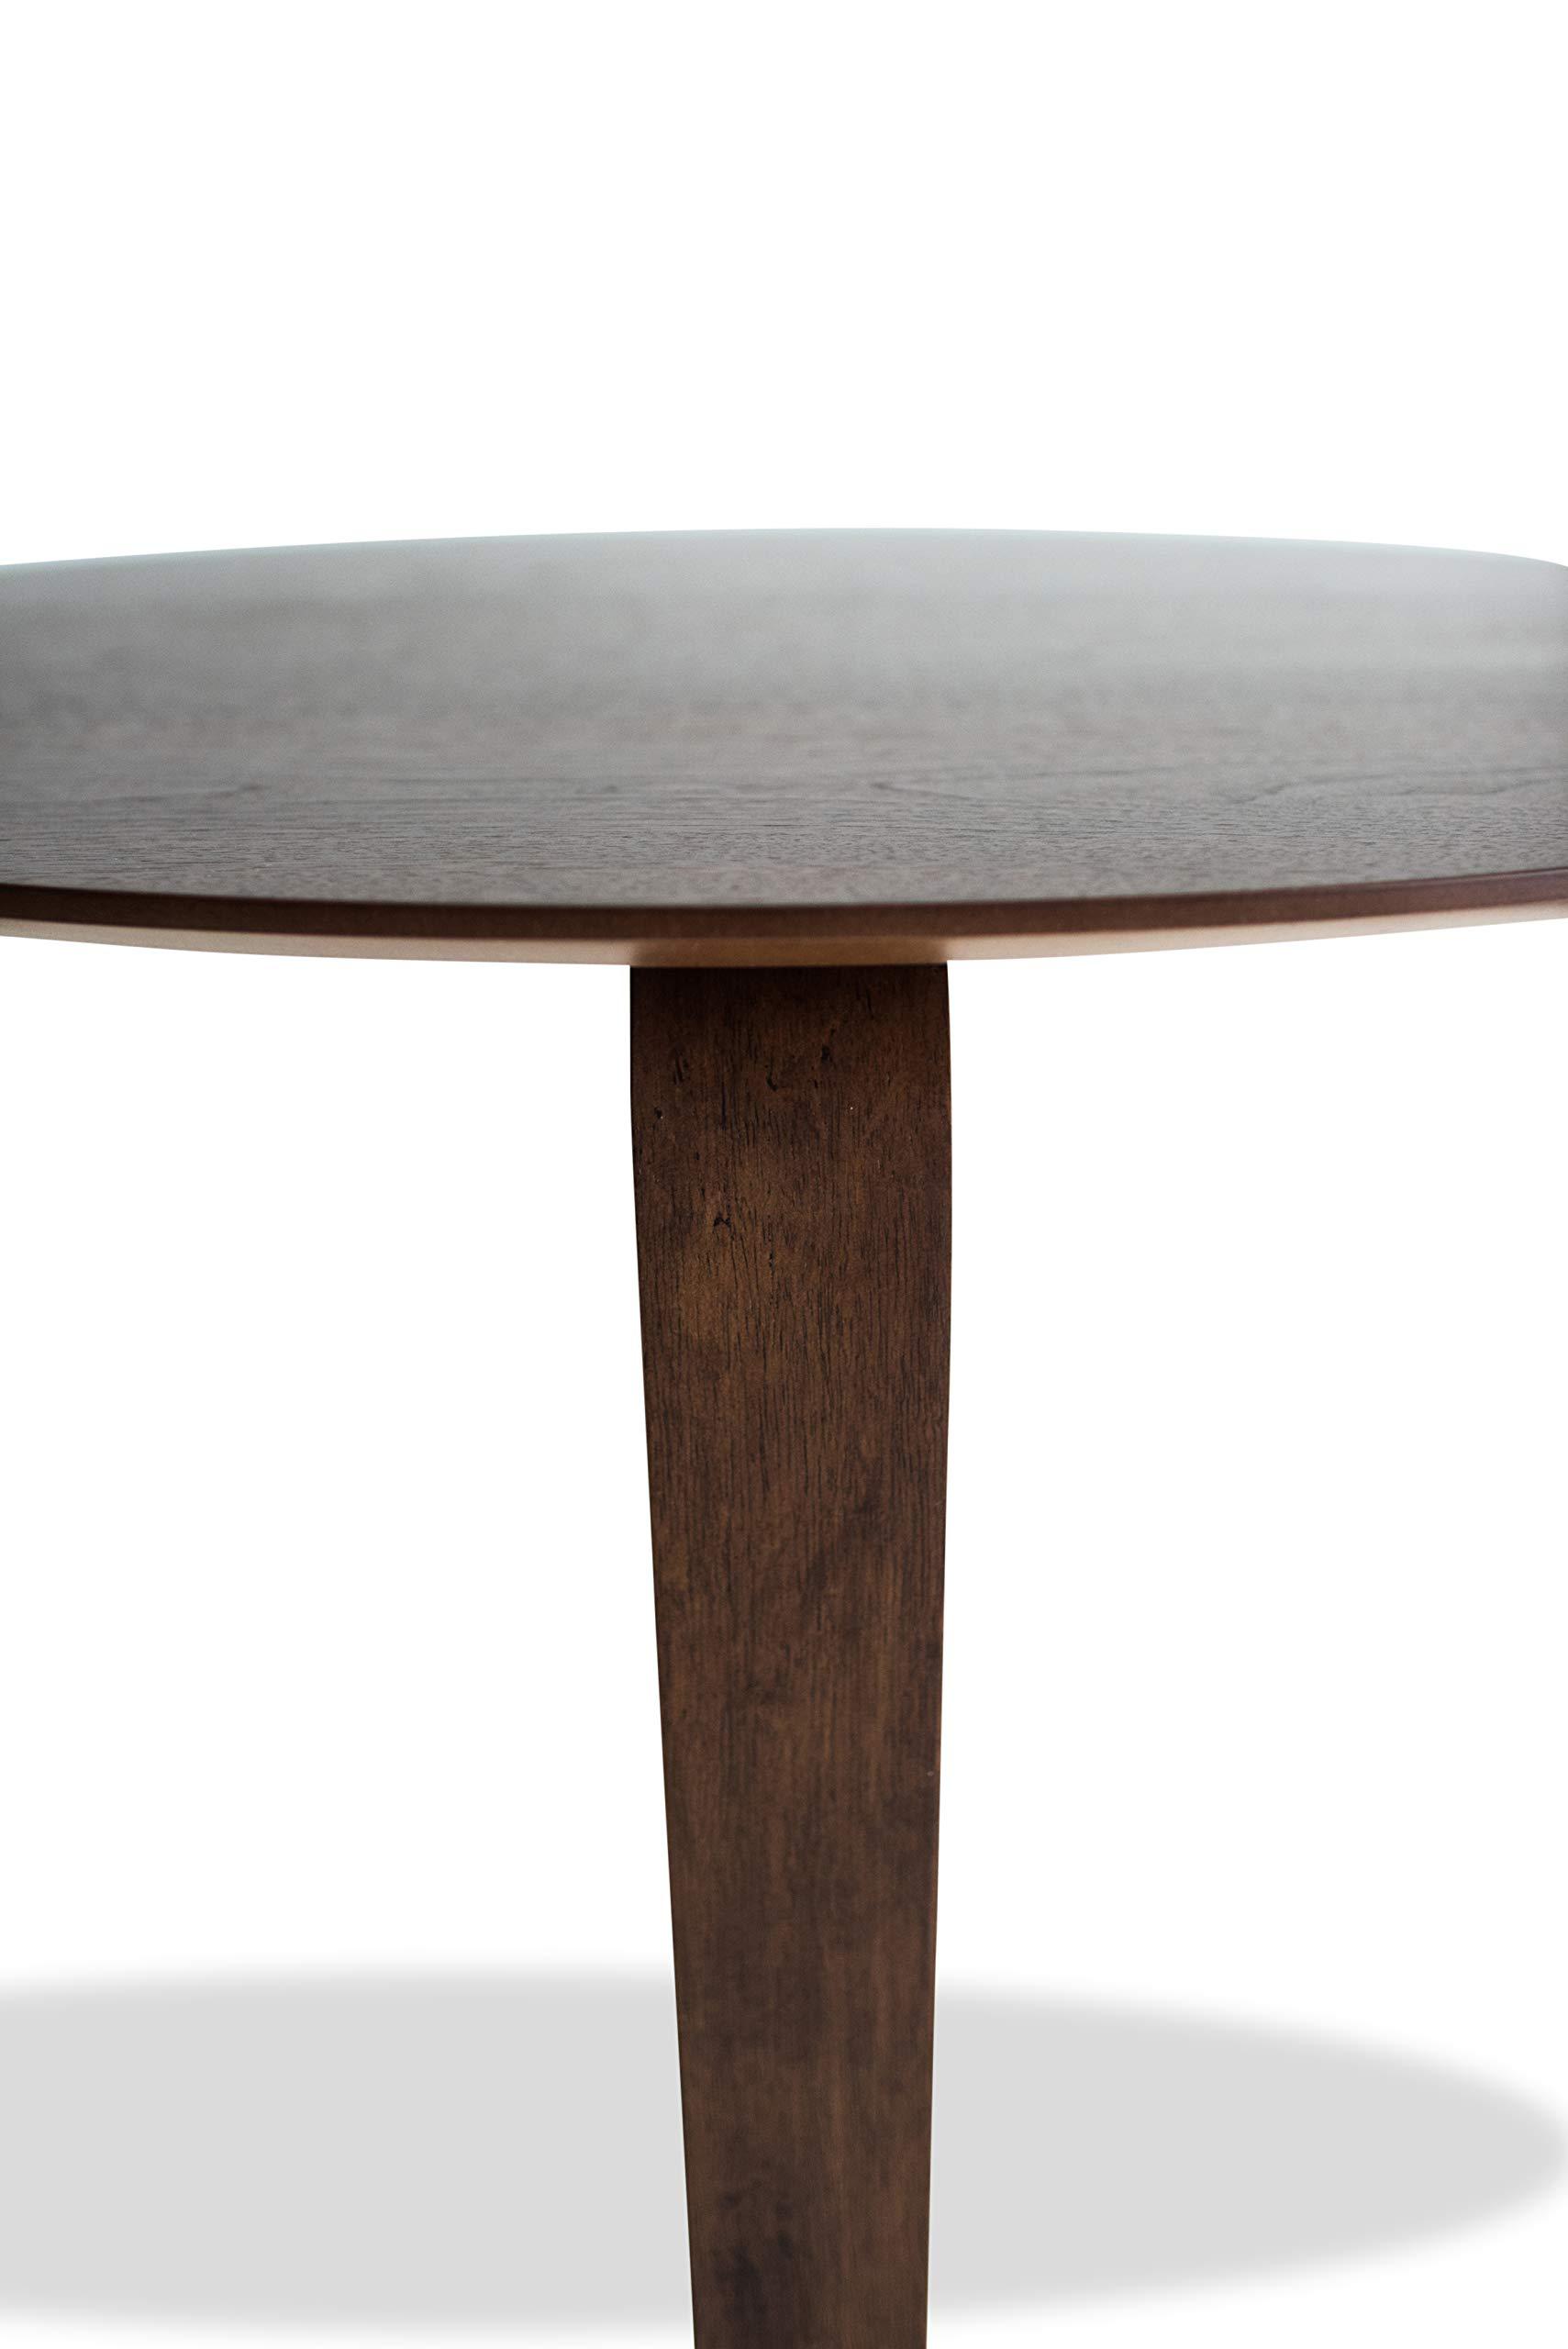 Edloe Finch YUMI Mid-Century Modern Round Dining Table Kitchen Walnut by Edloe Finch (Image #8)